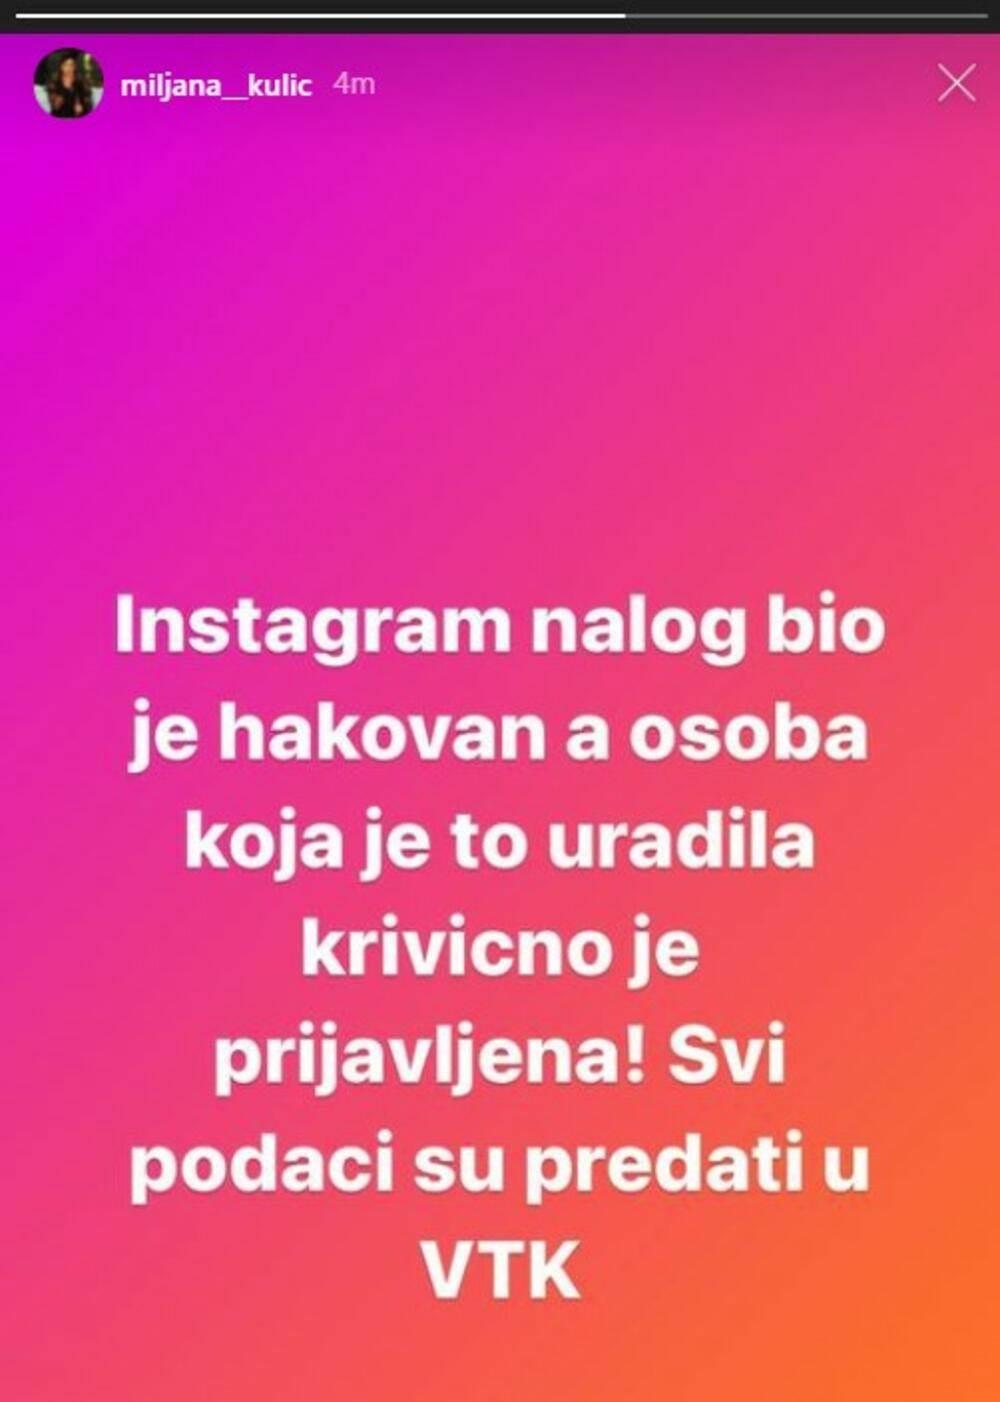 Miljana Kulić hakovan profil